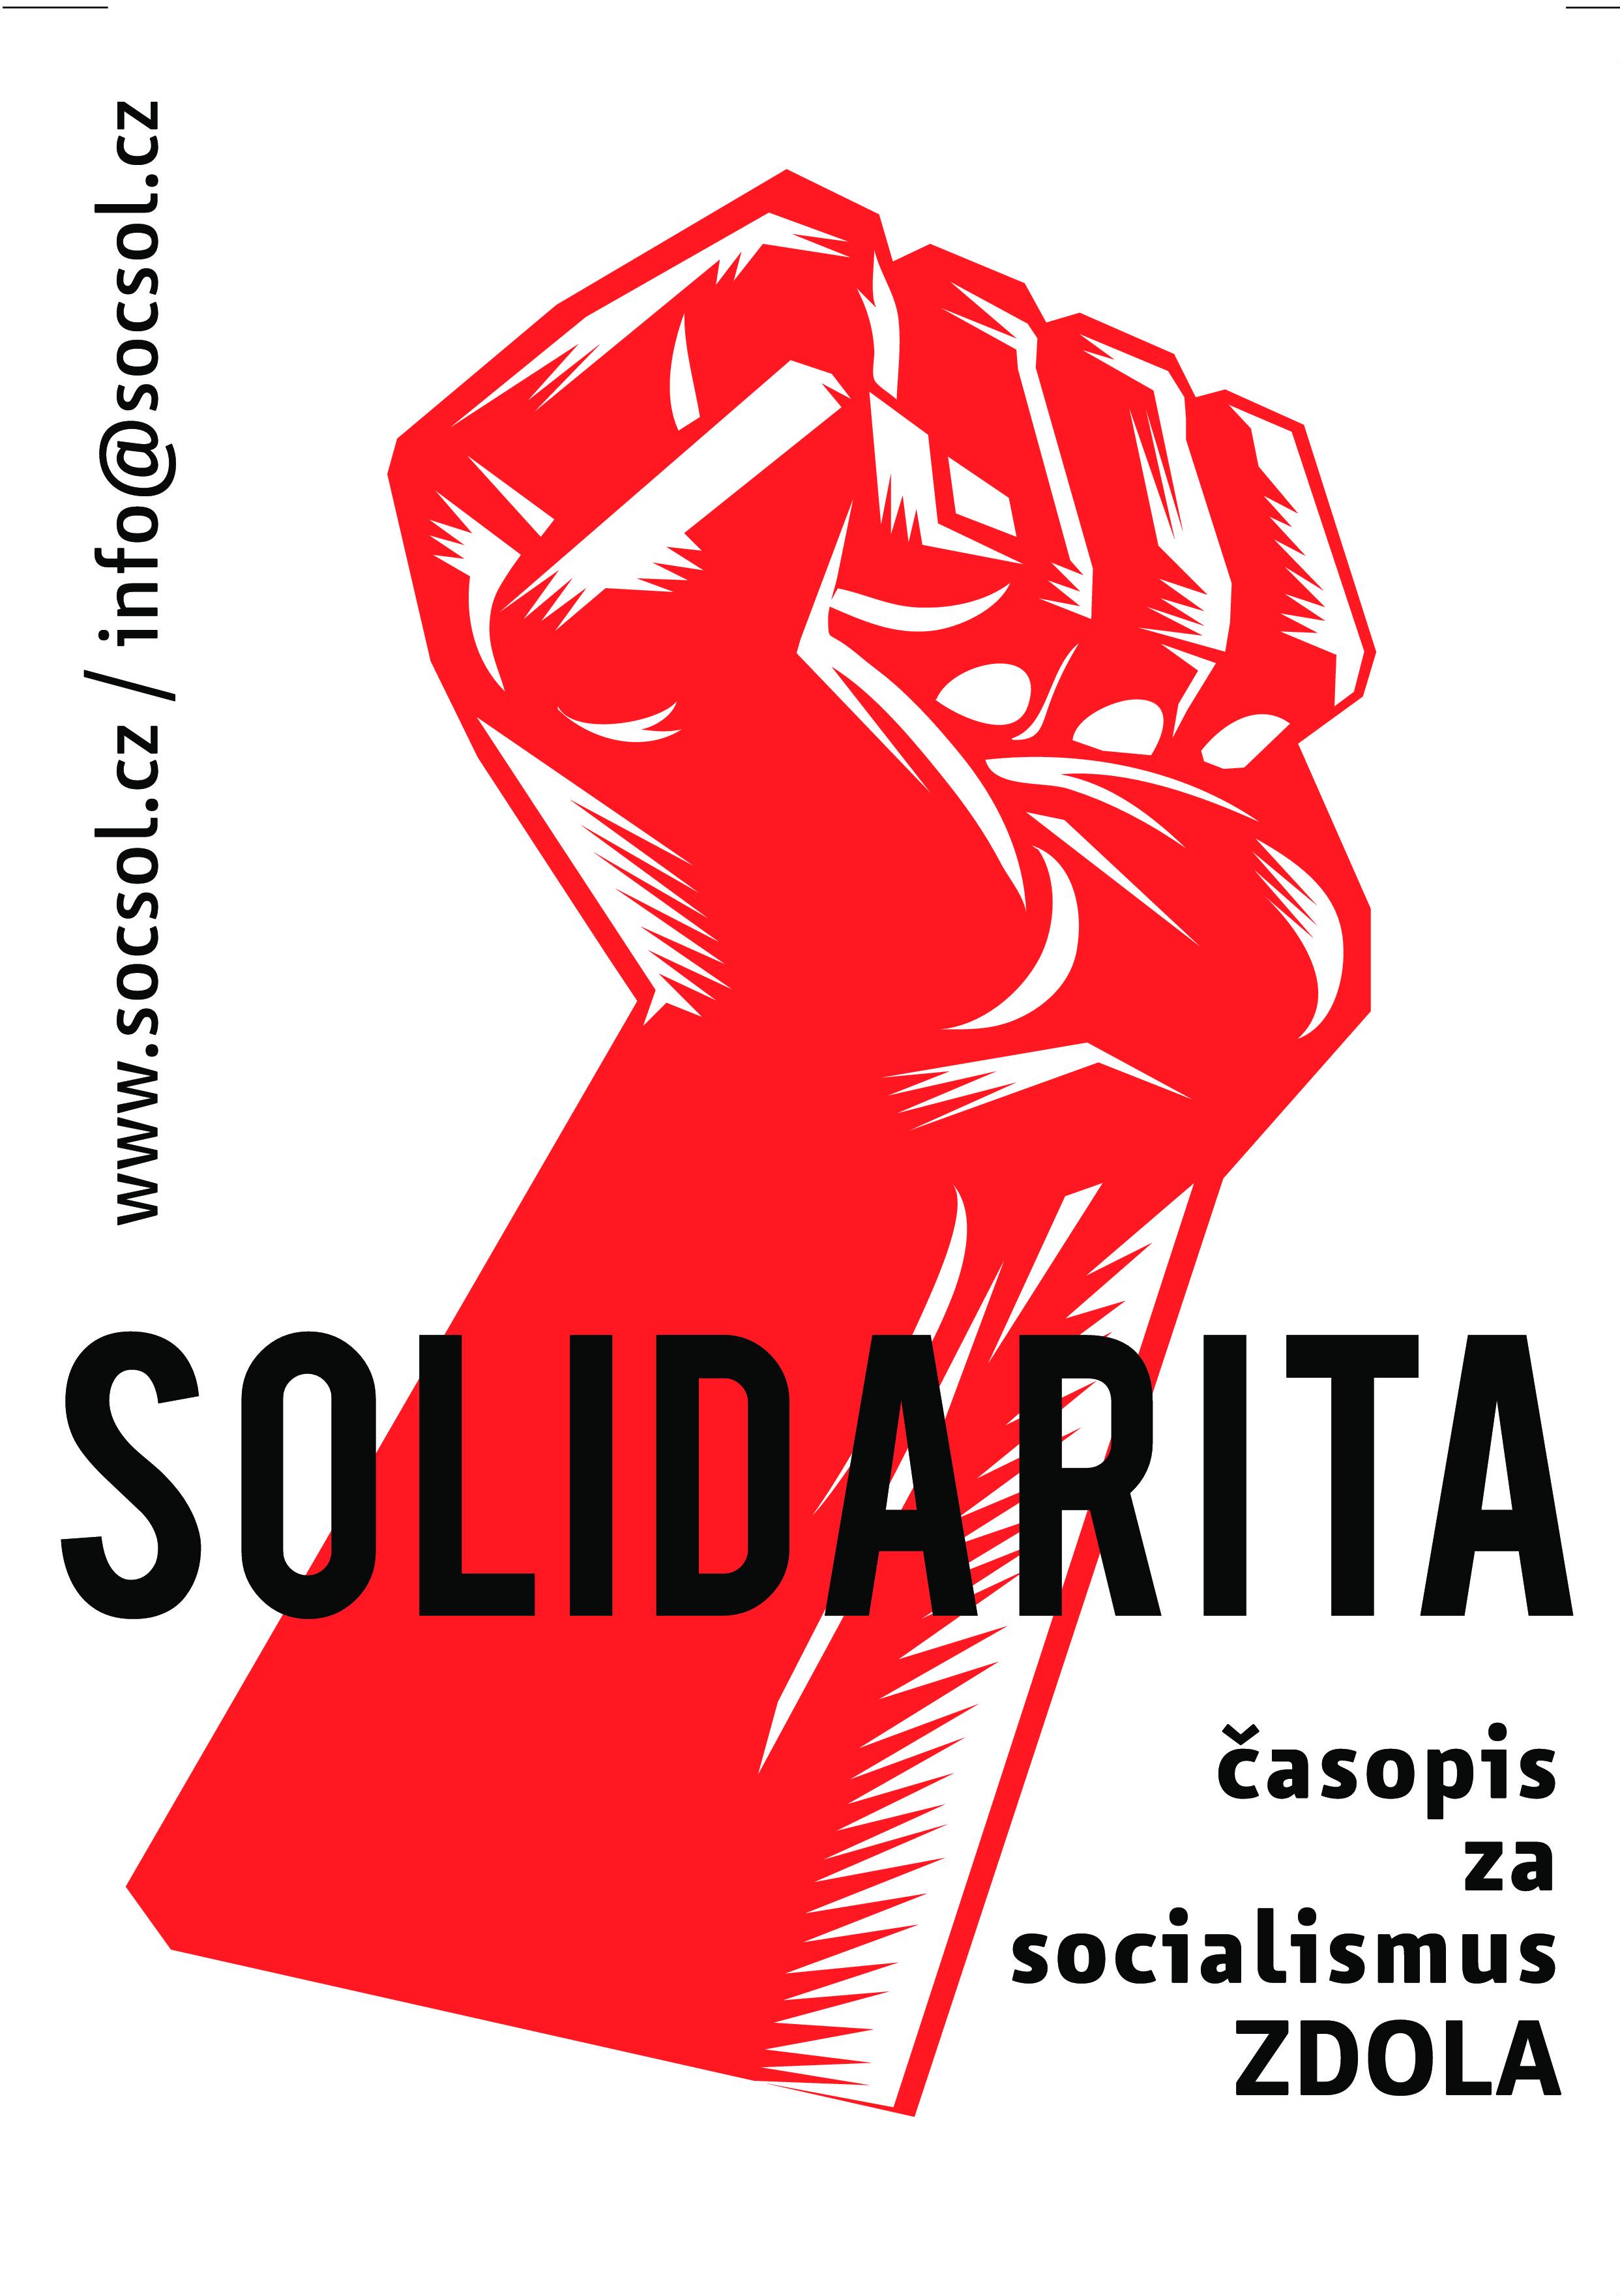 nahledSocSol_solidarita_pest